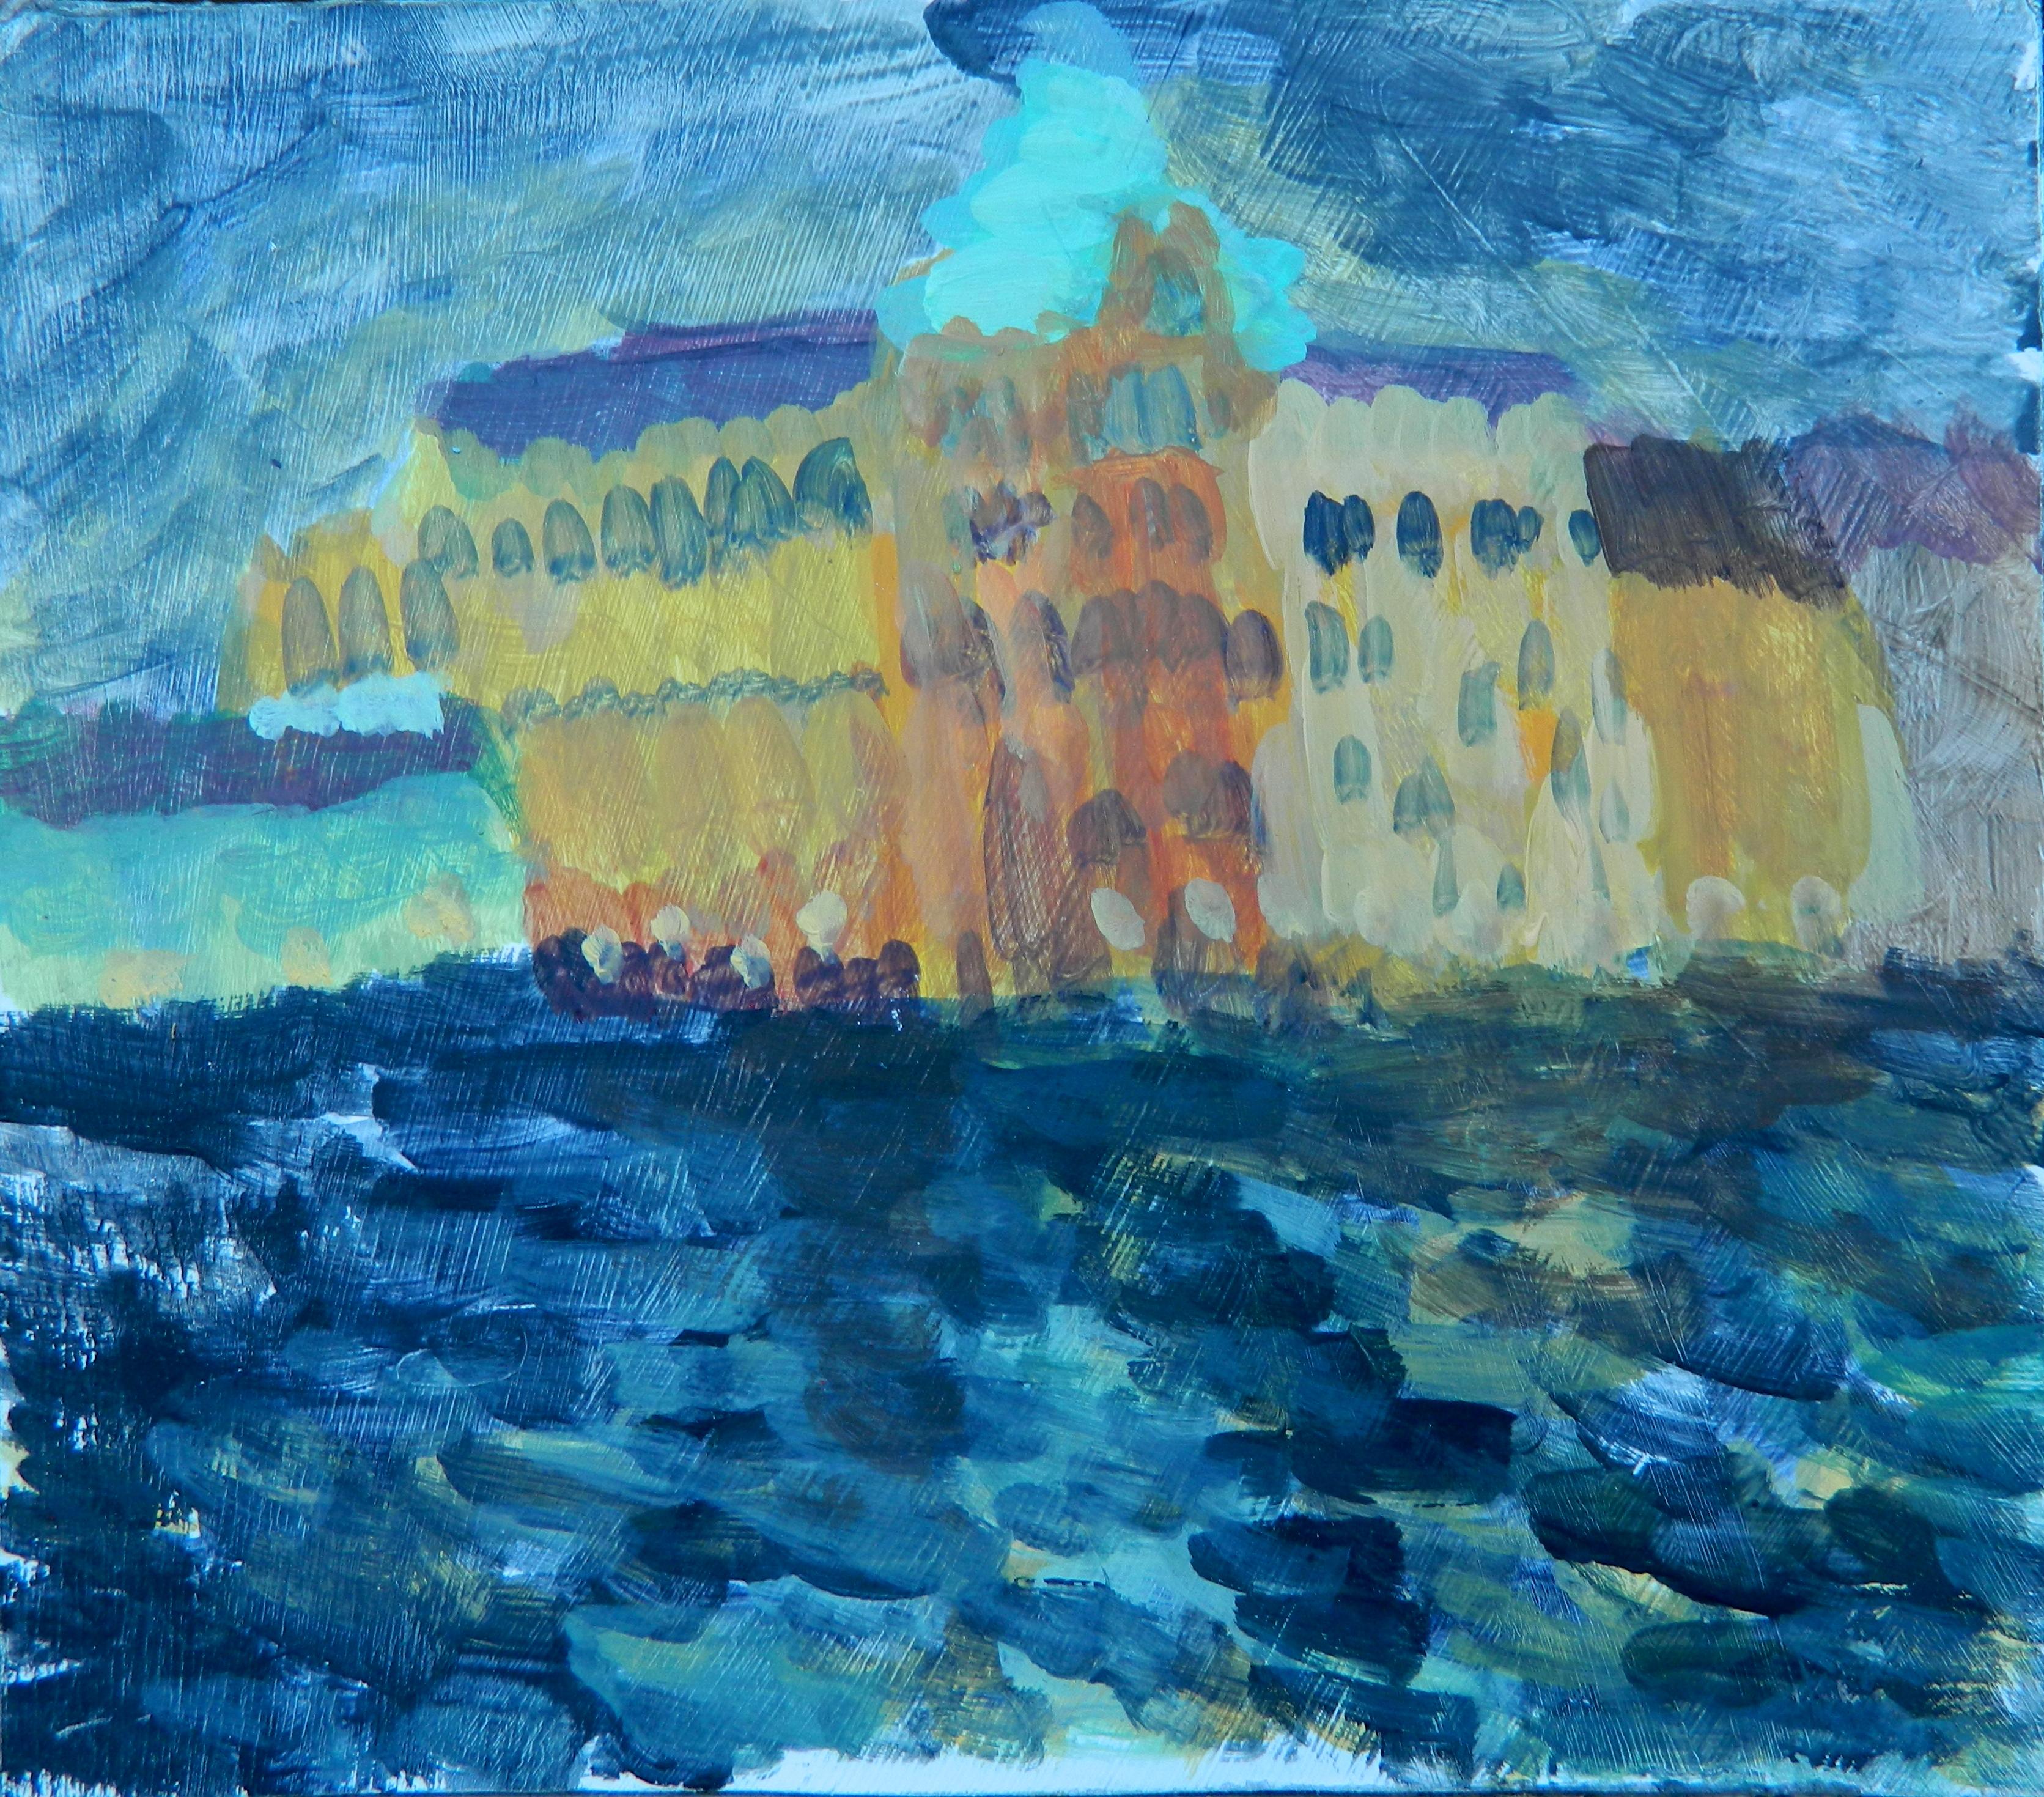 Mystery Building, Venice (night)